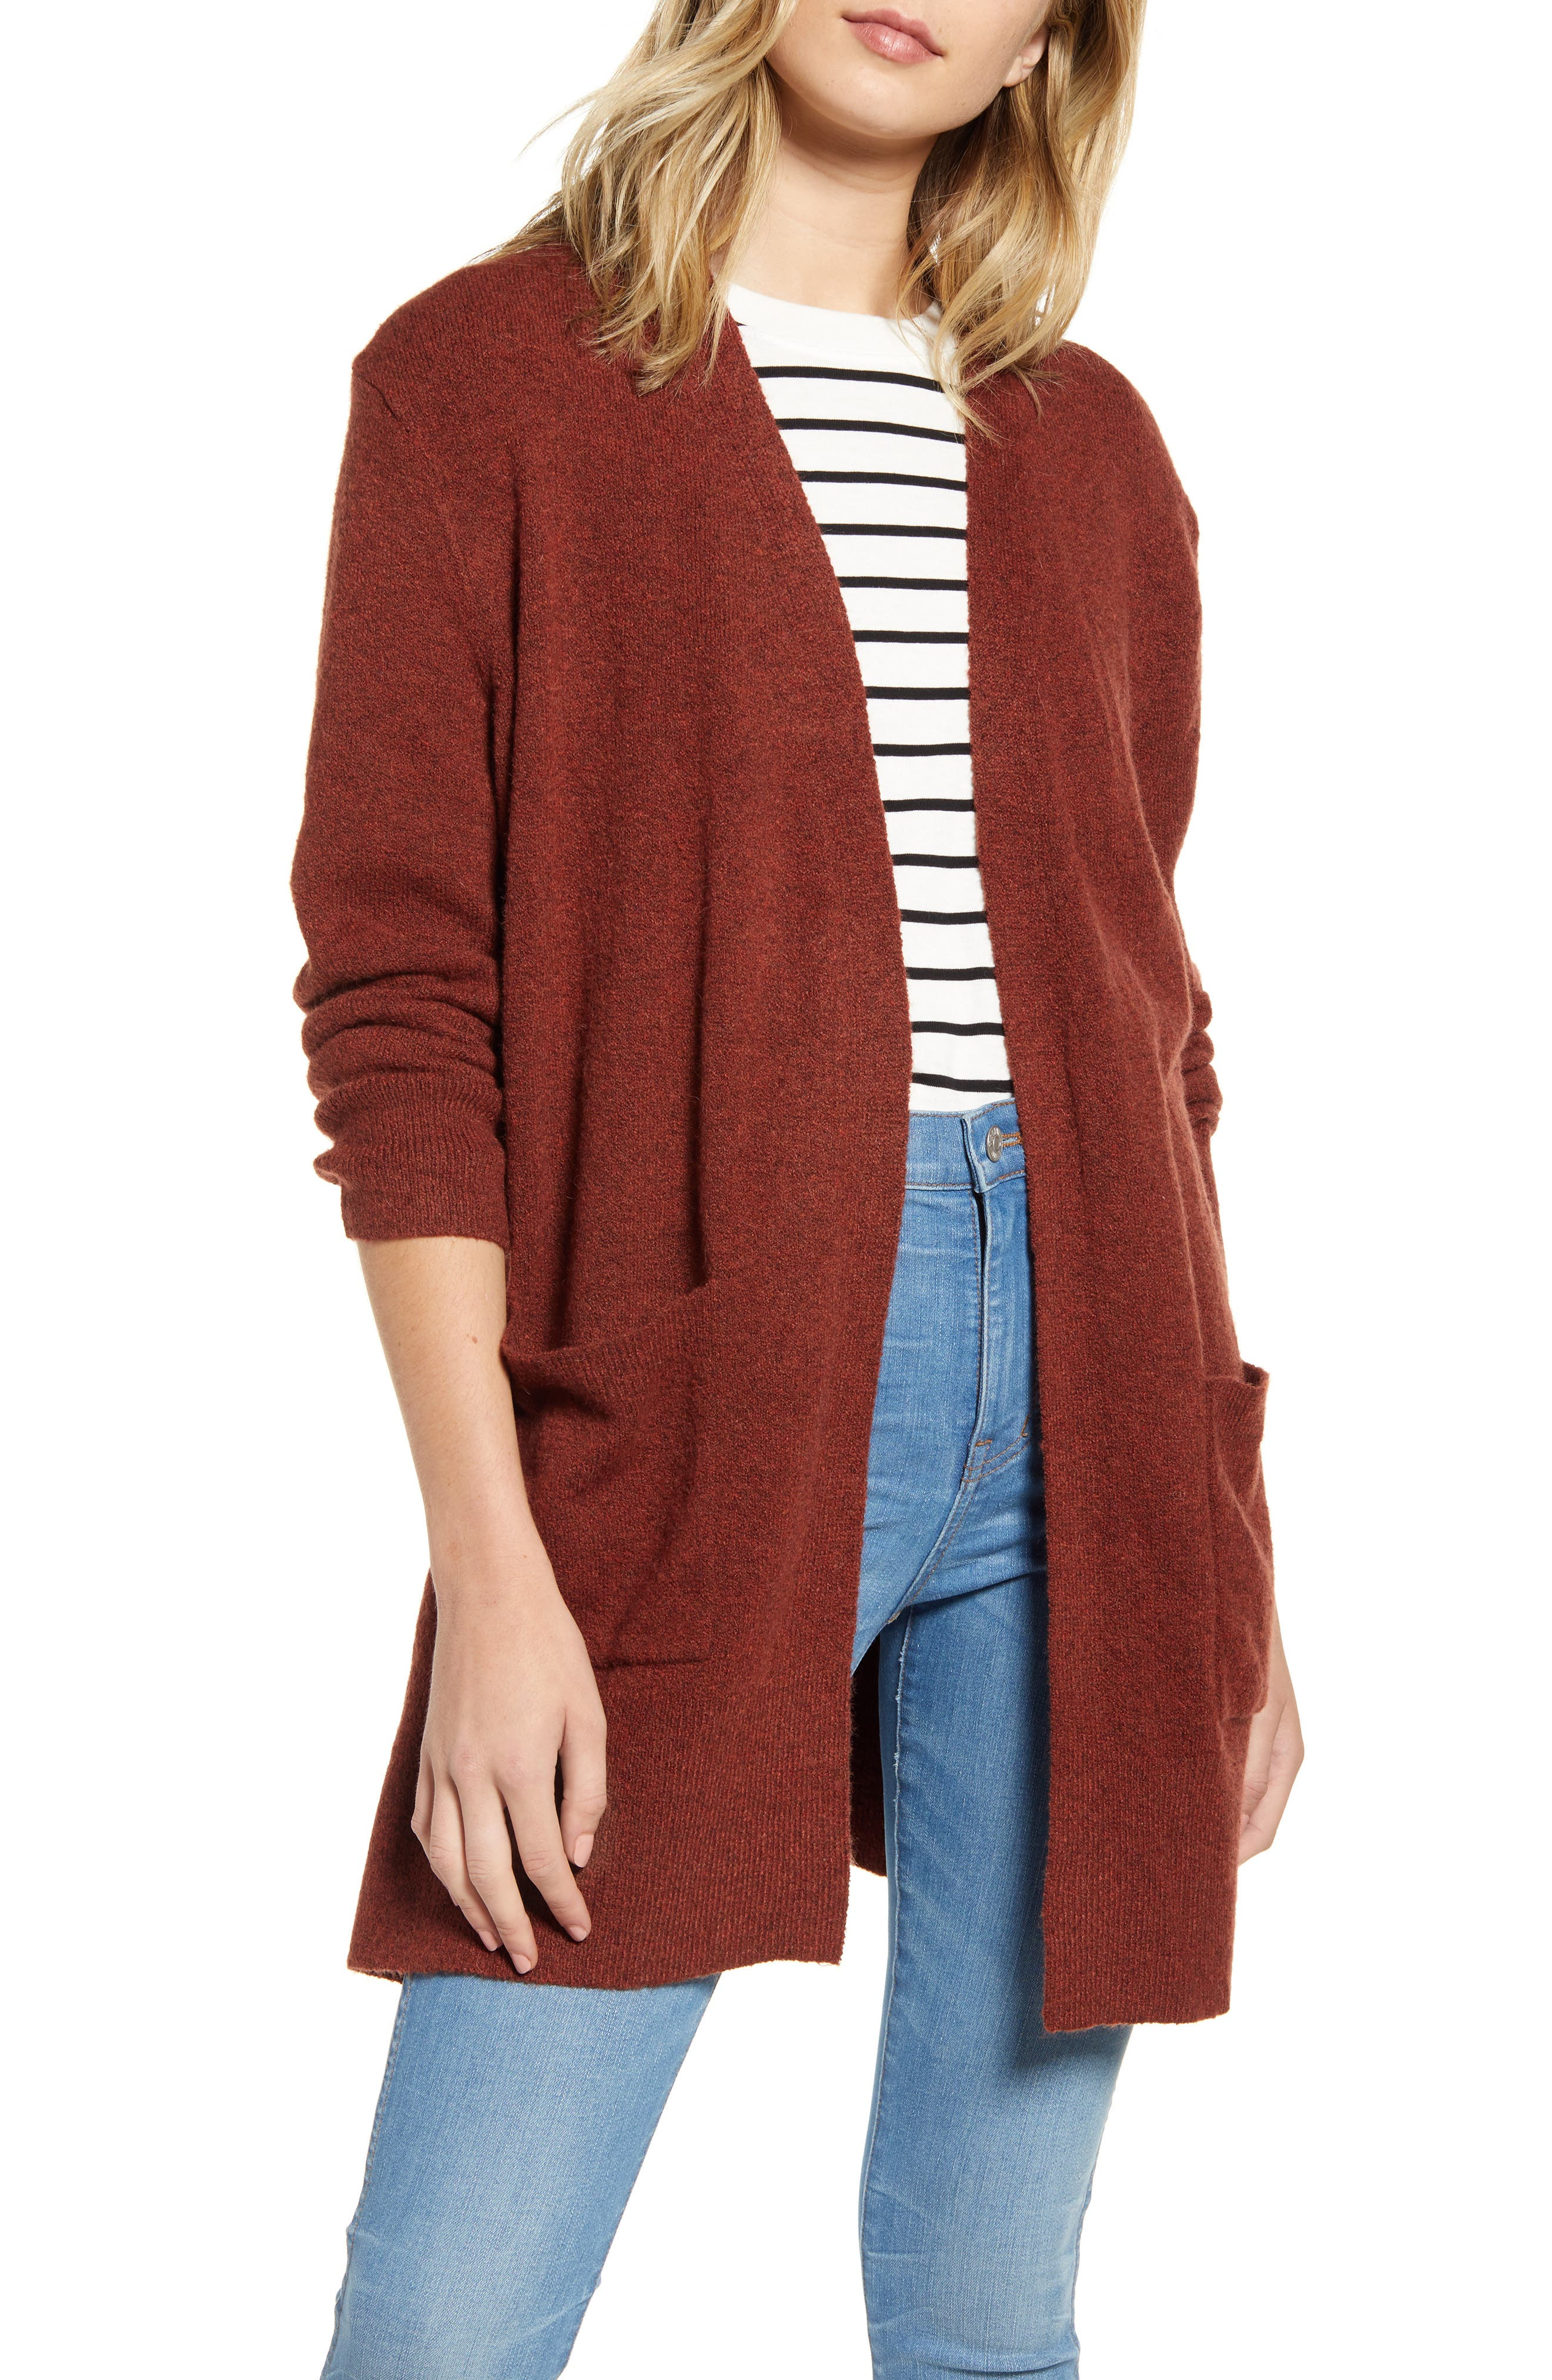 Madewell Kent Cardigan Sweater (Regular & Plus Size)